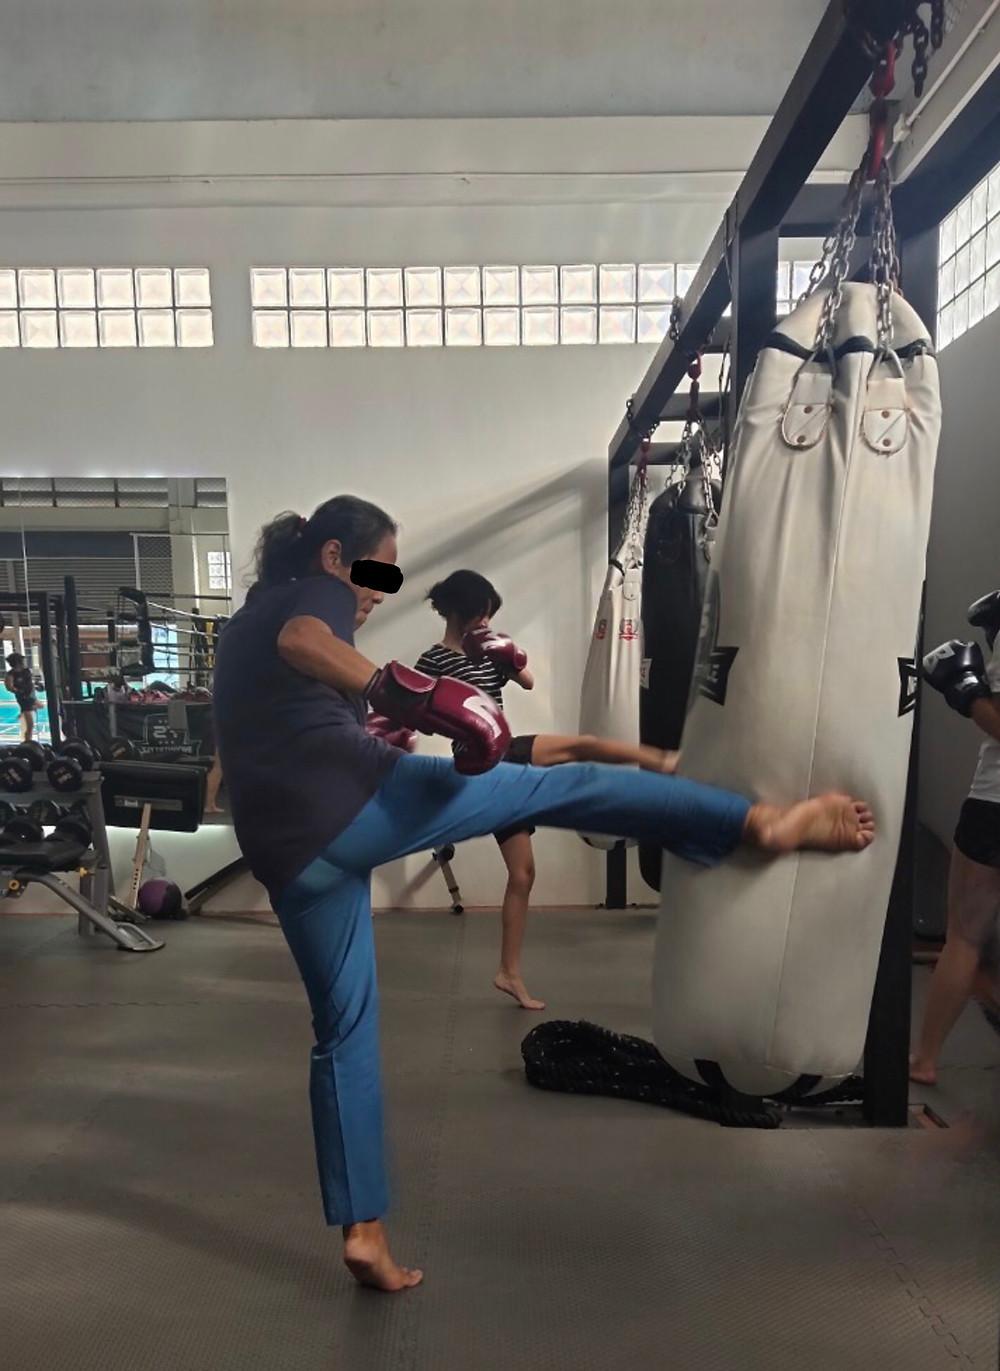 Women kicking a punchbag - Break the Silence group